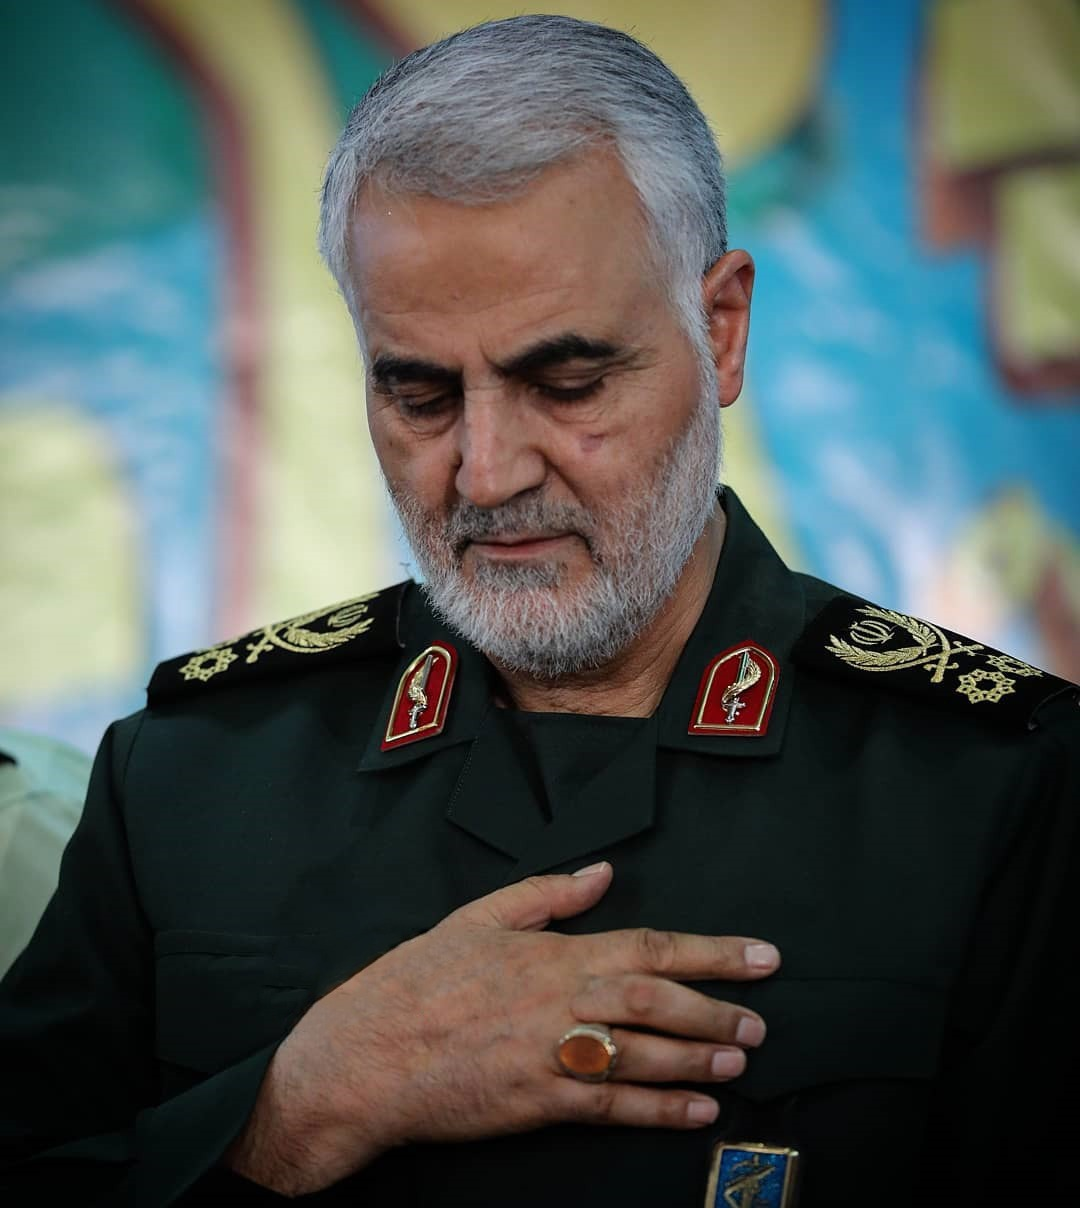 عکس پروفایل سردار شهید حاج قاسم سلیمانی